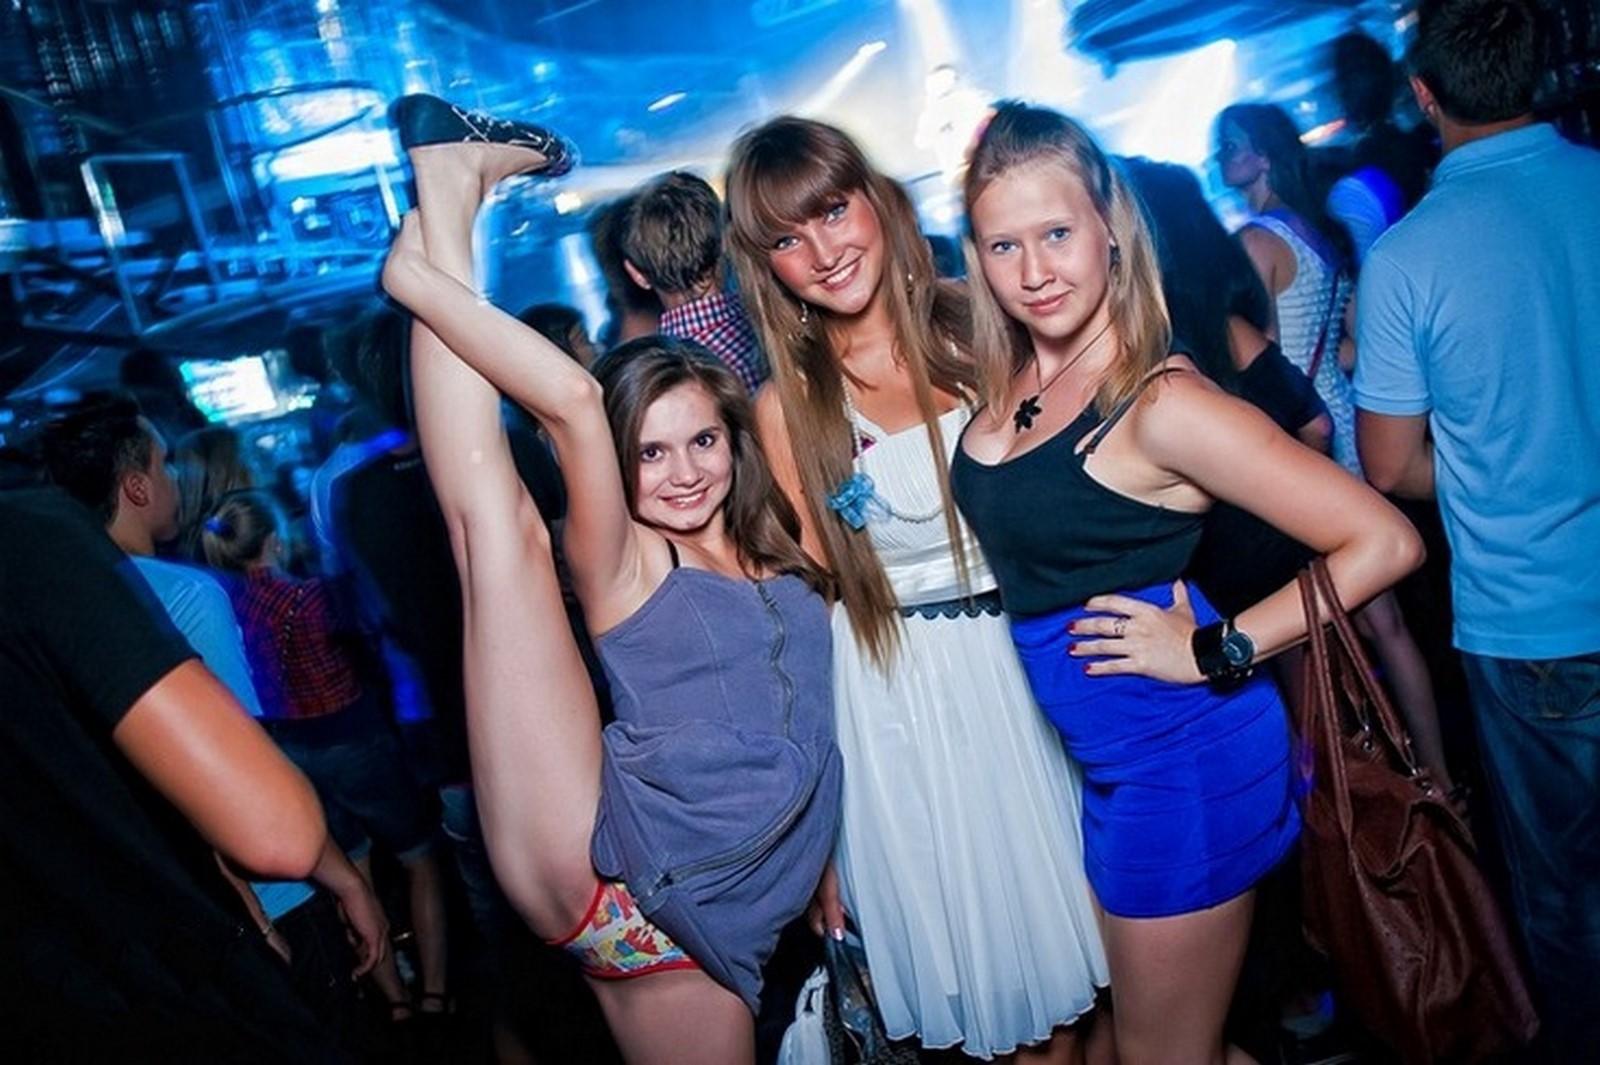 Пьяная гибкая русская девушка